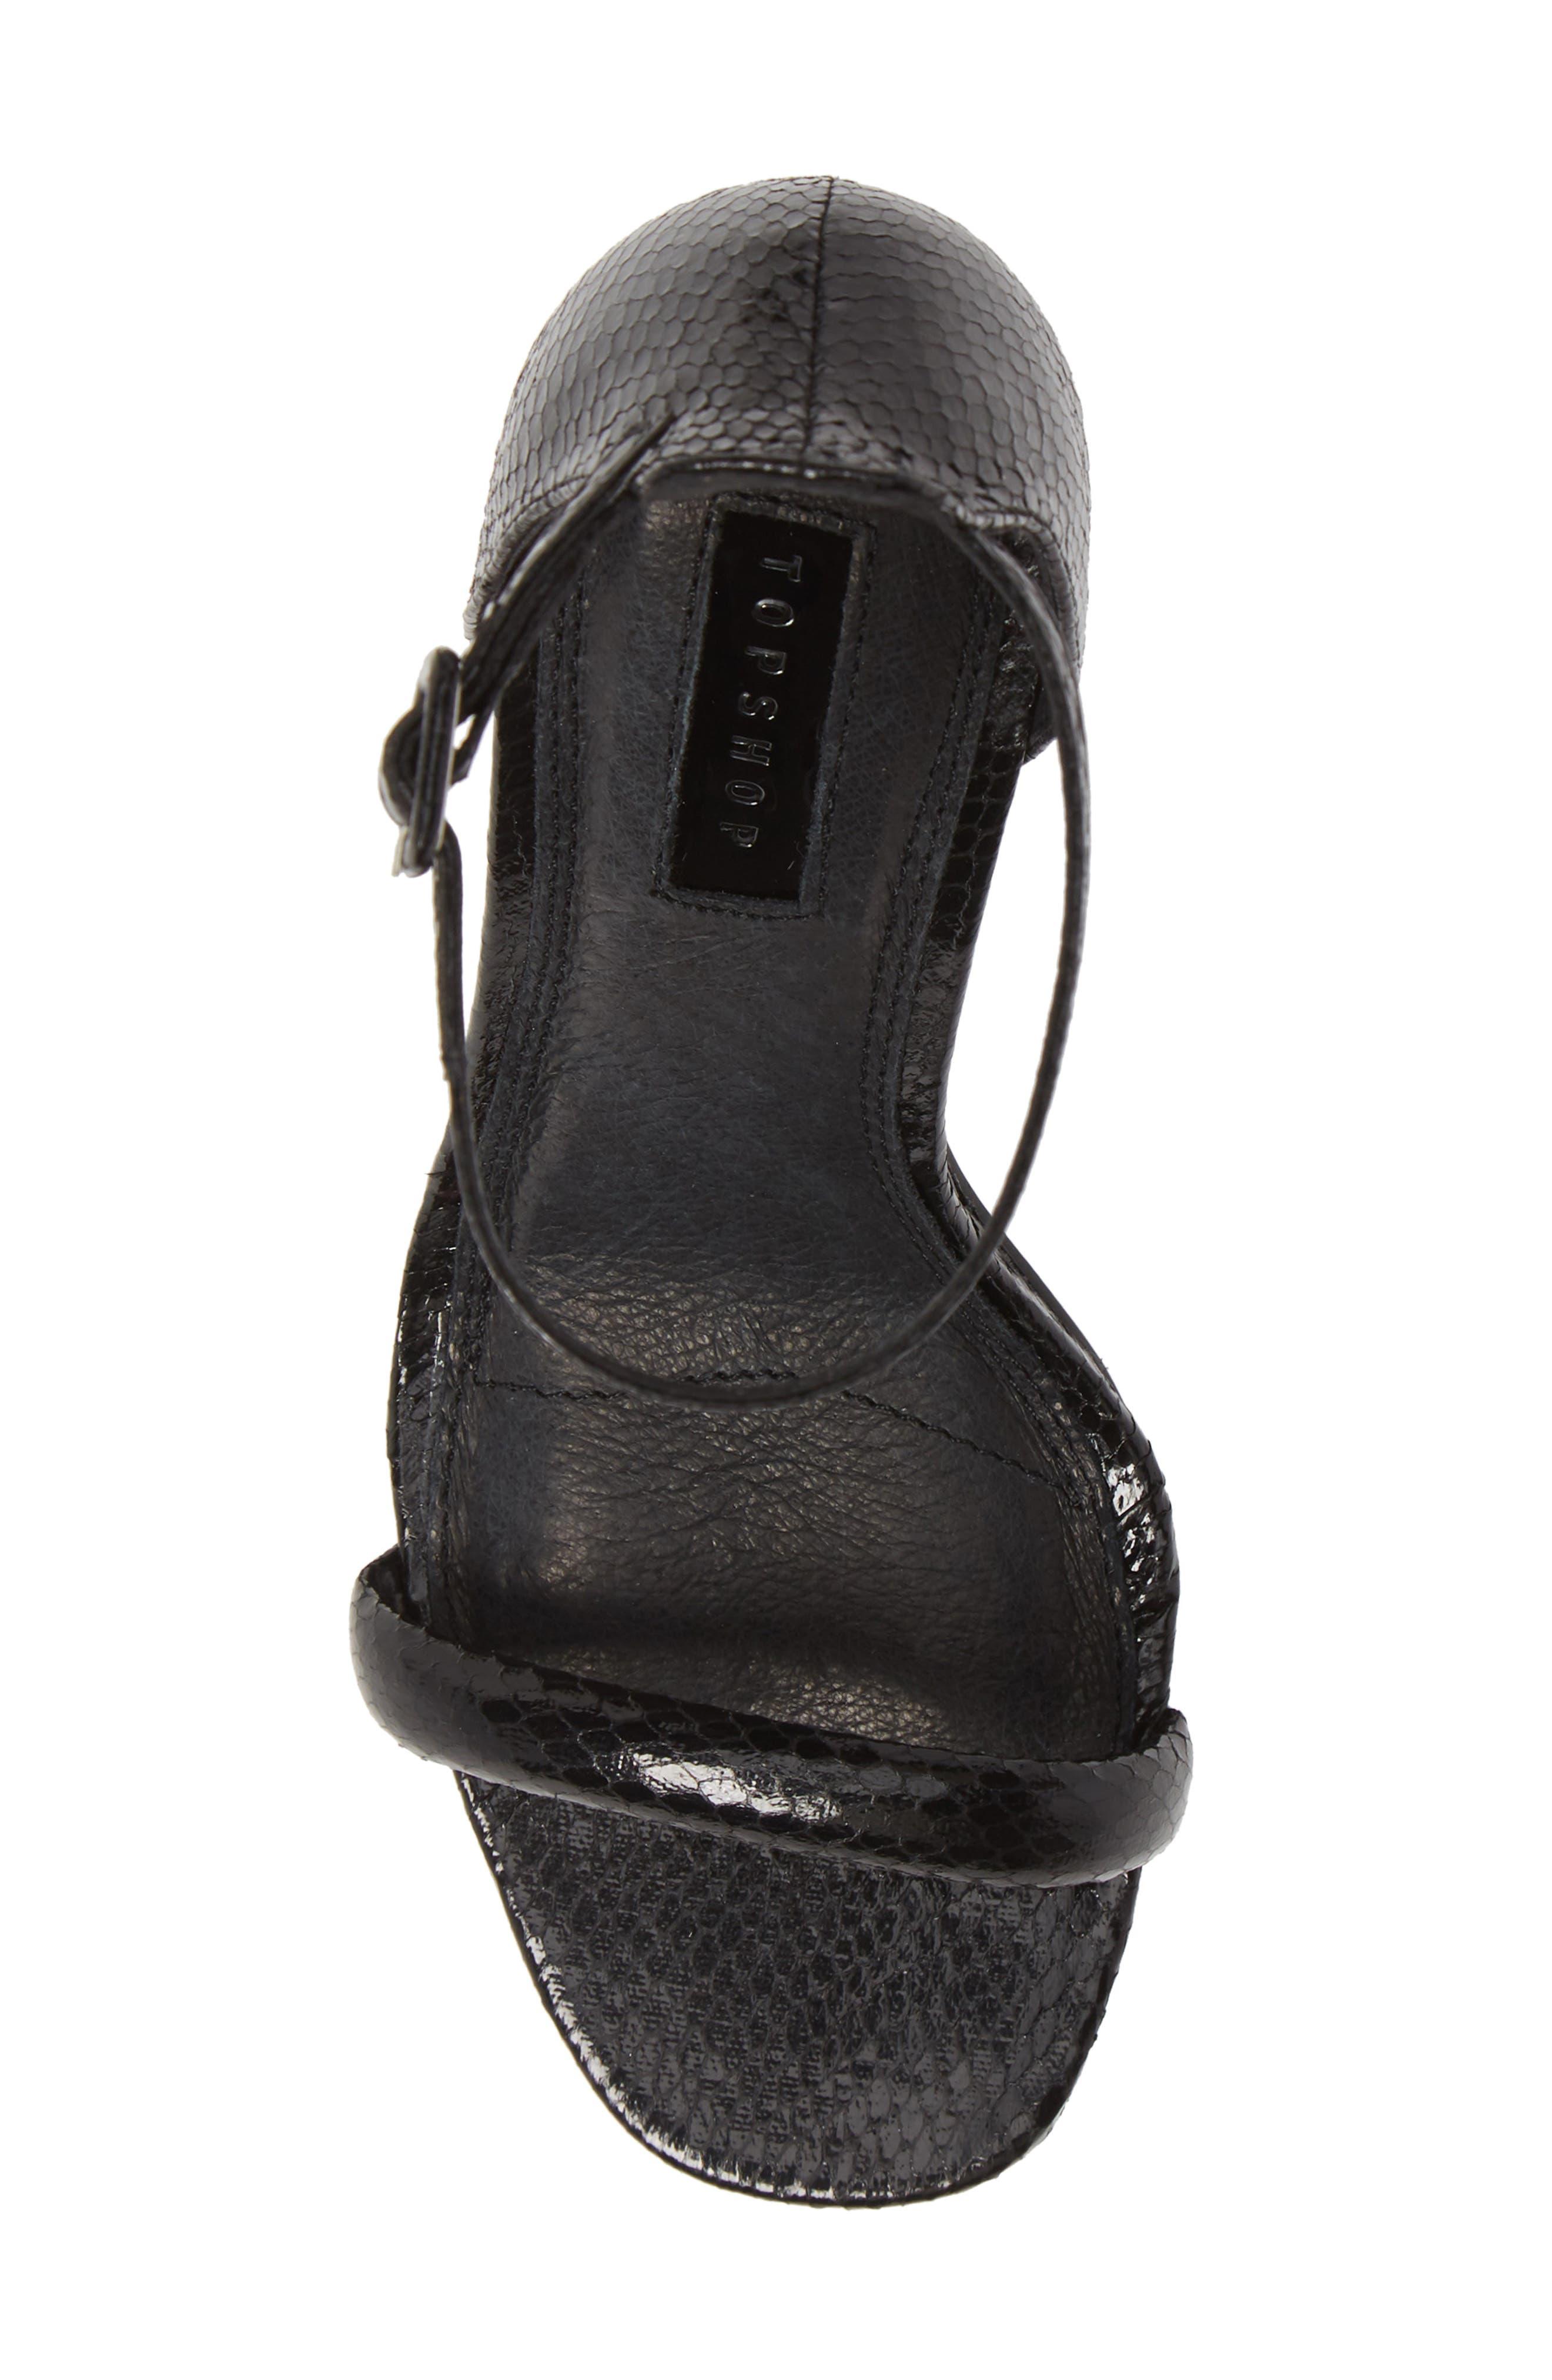 TOPSHOP, Robyn Ankle Strap Sandal, Alternate thumbnail 5, color, BLACK